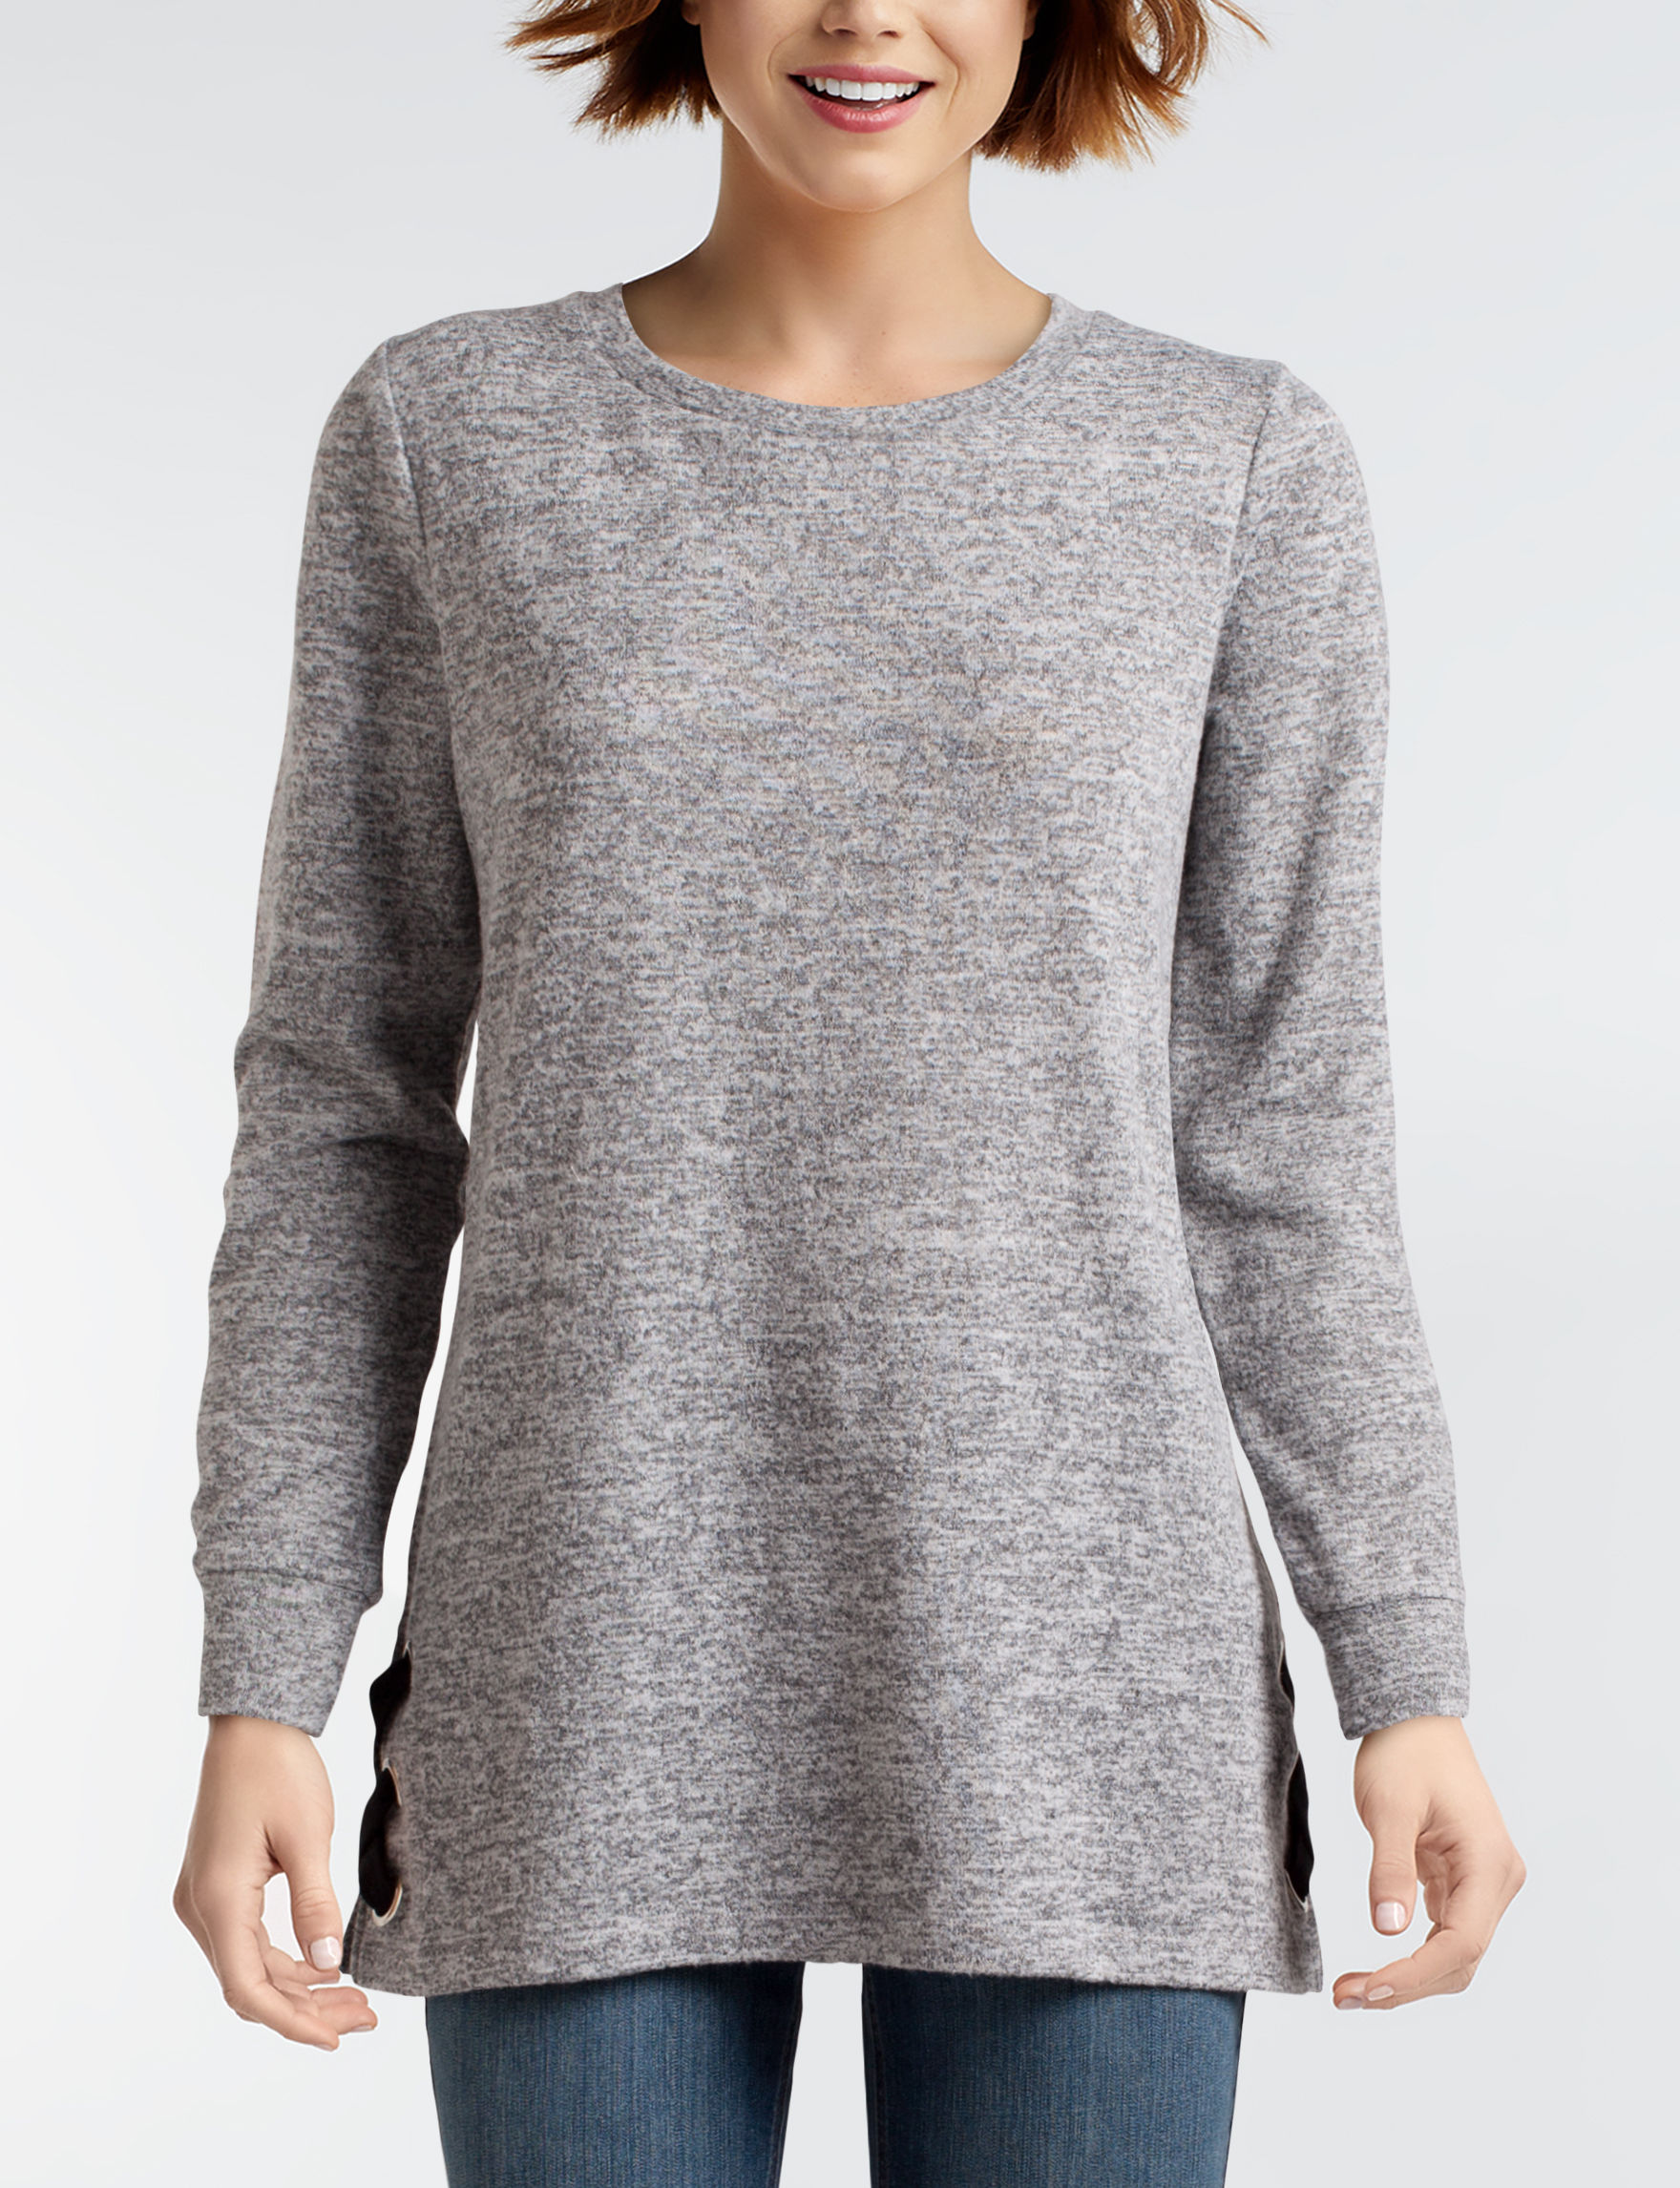 Signature Studio Grey Shirts & Blouses